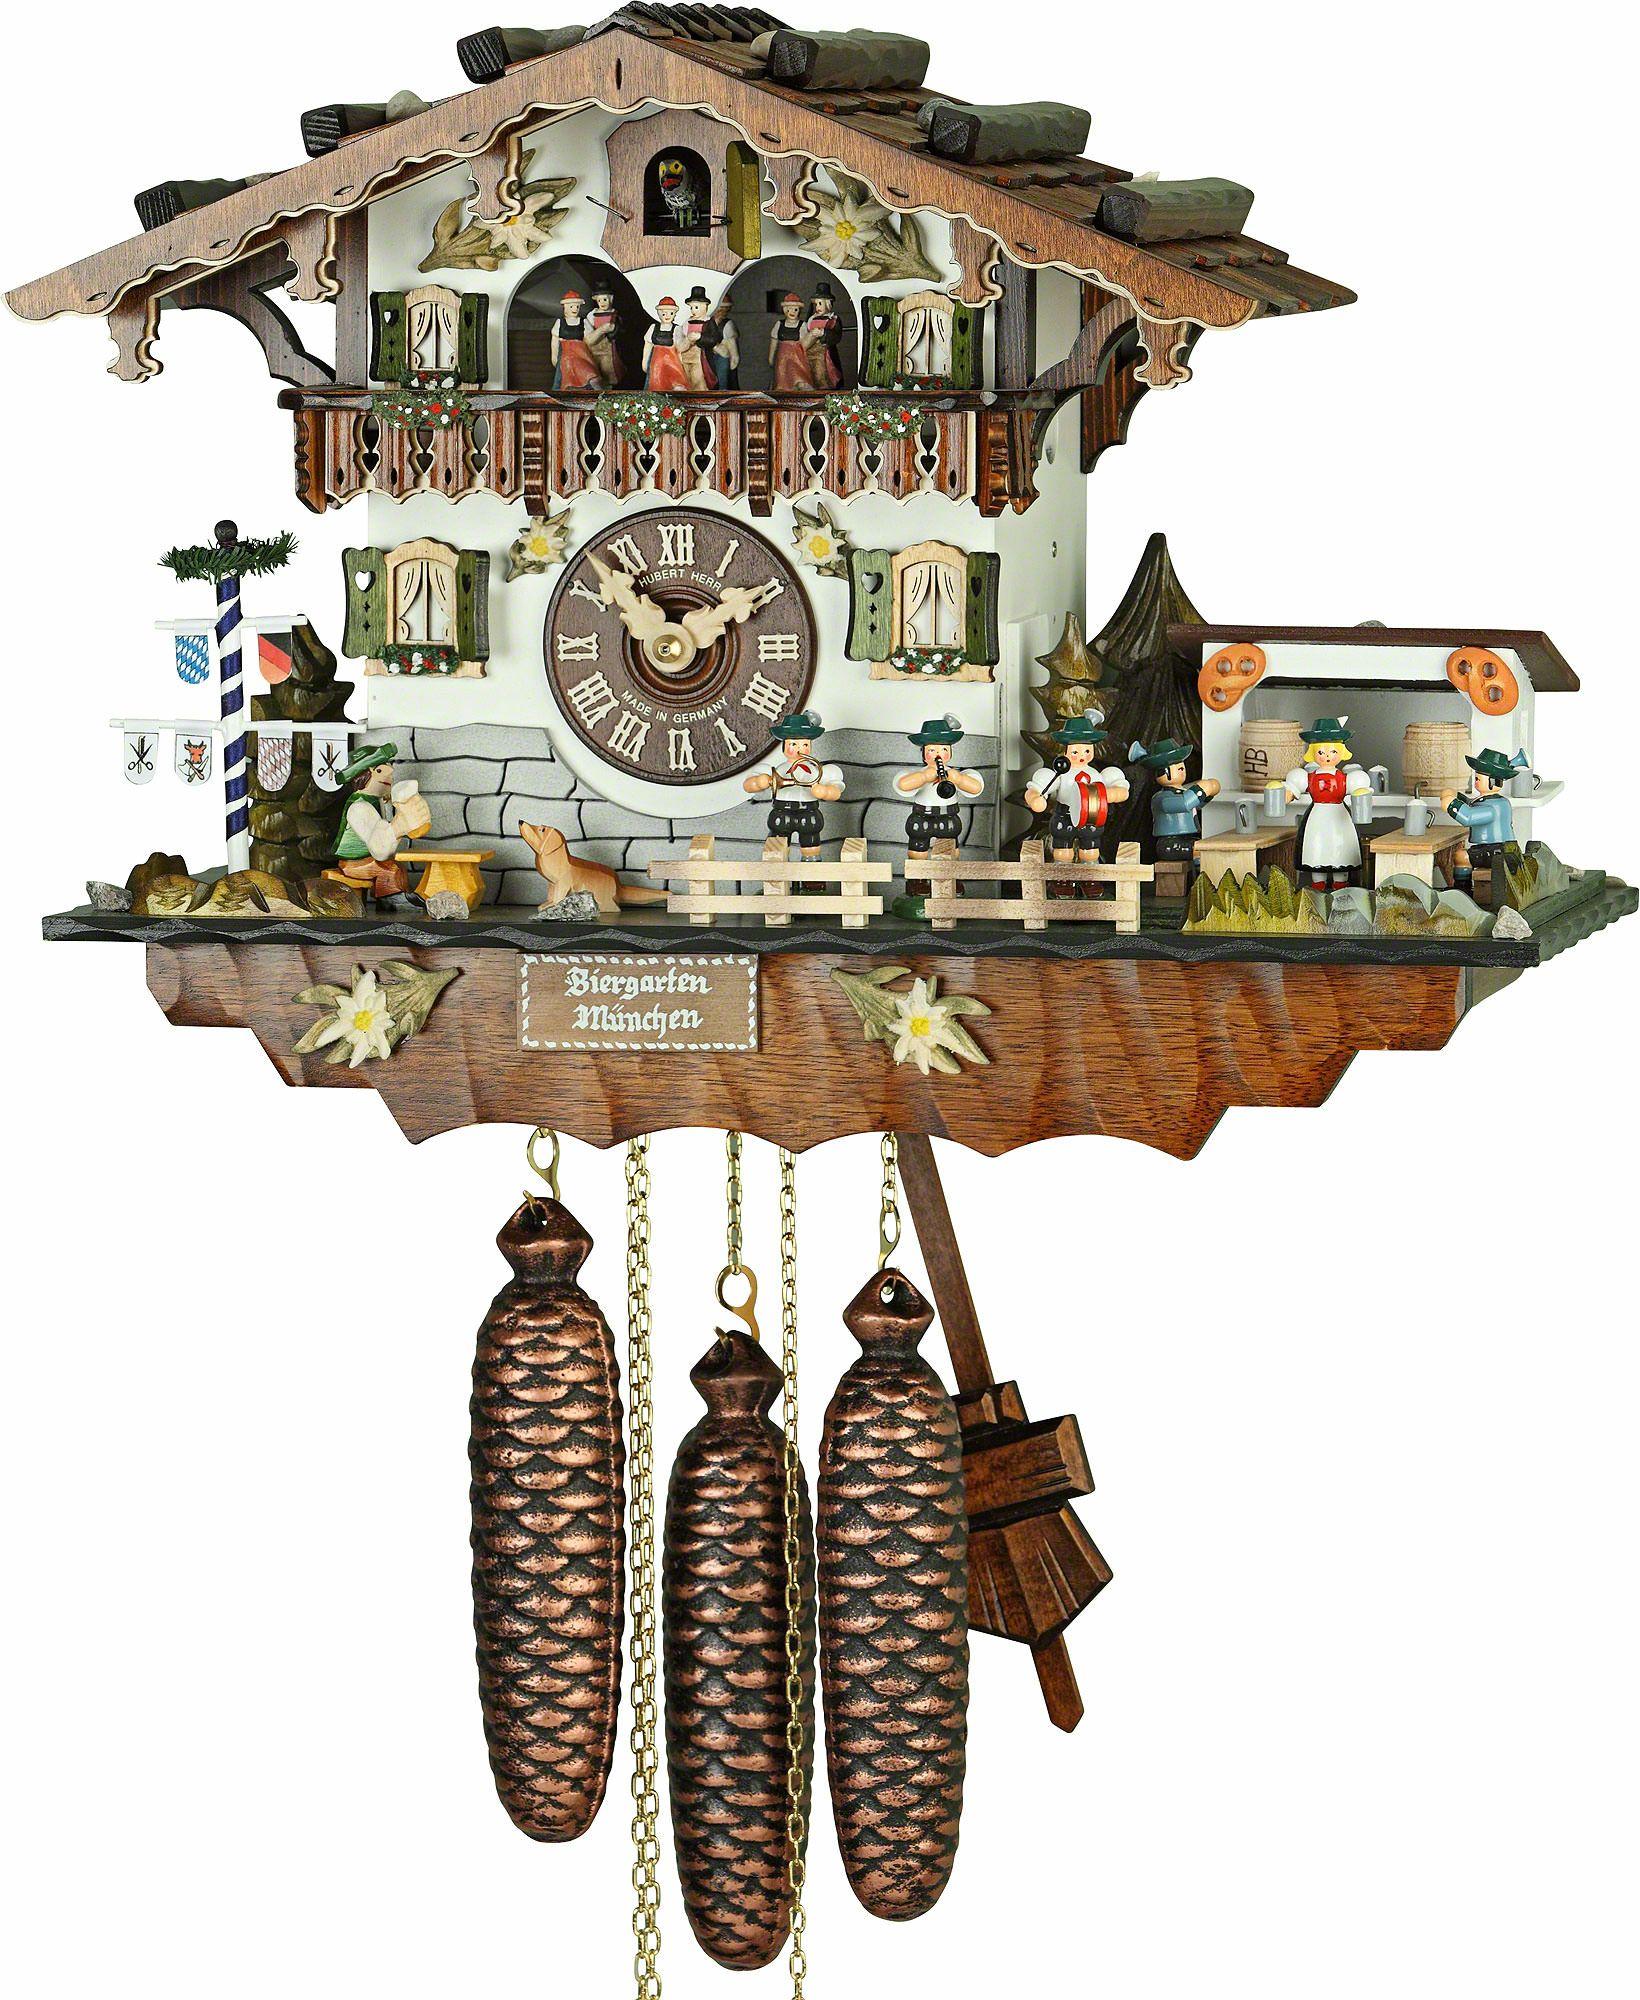 Chalet Cuckoo Clocks Cuckoo Clock 8 Day Movement Chalet Style 32cm By Hubert Herr Cuckoo Clock Clock Cuckoo